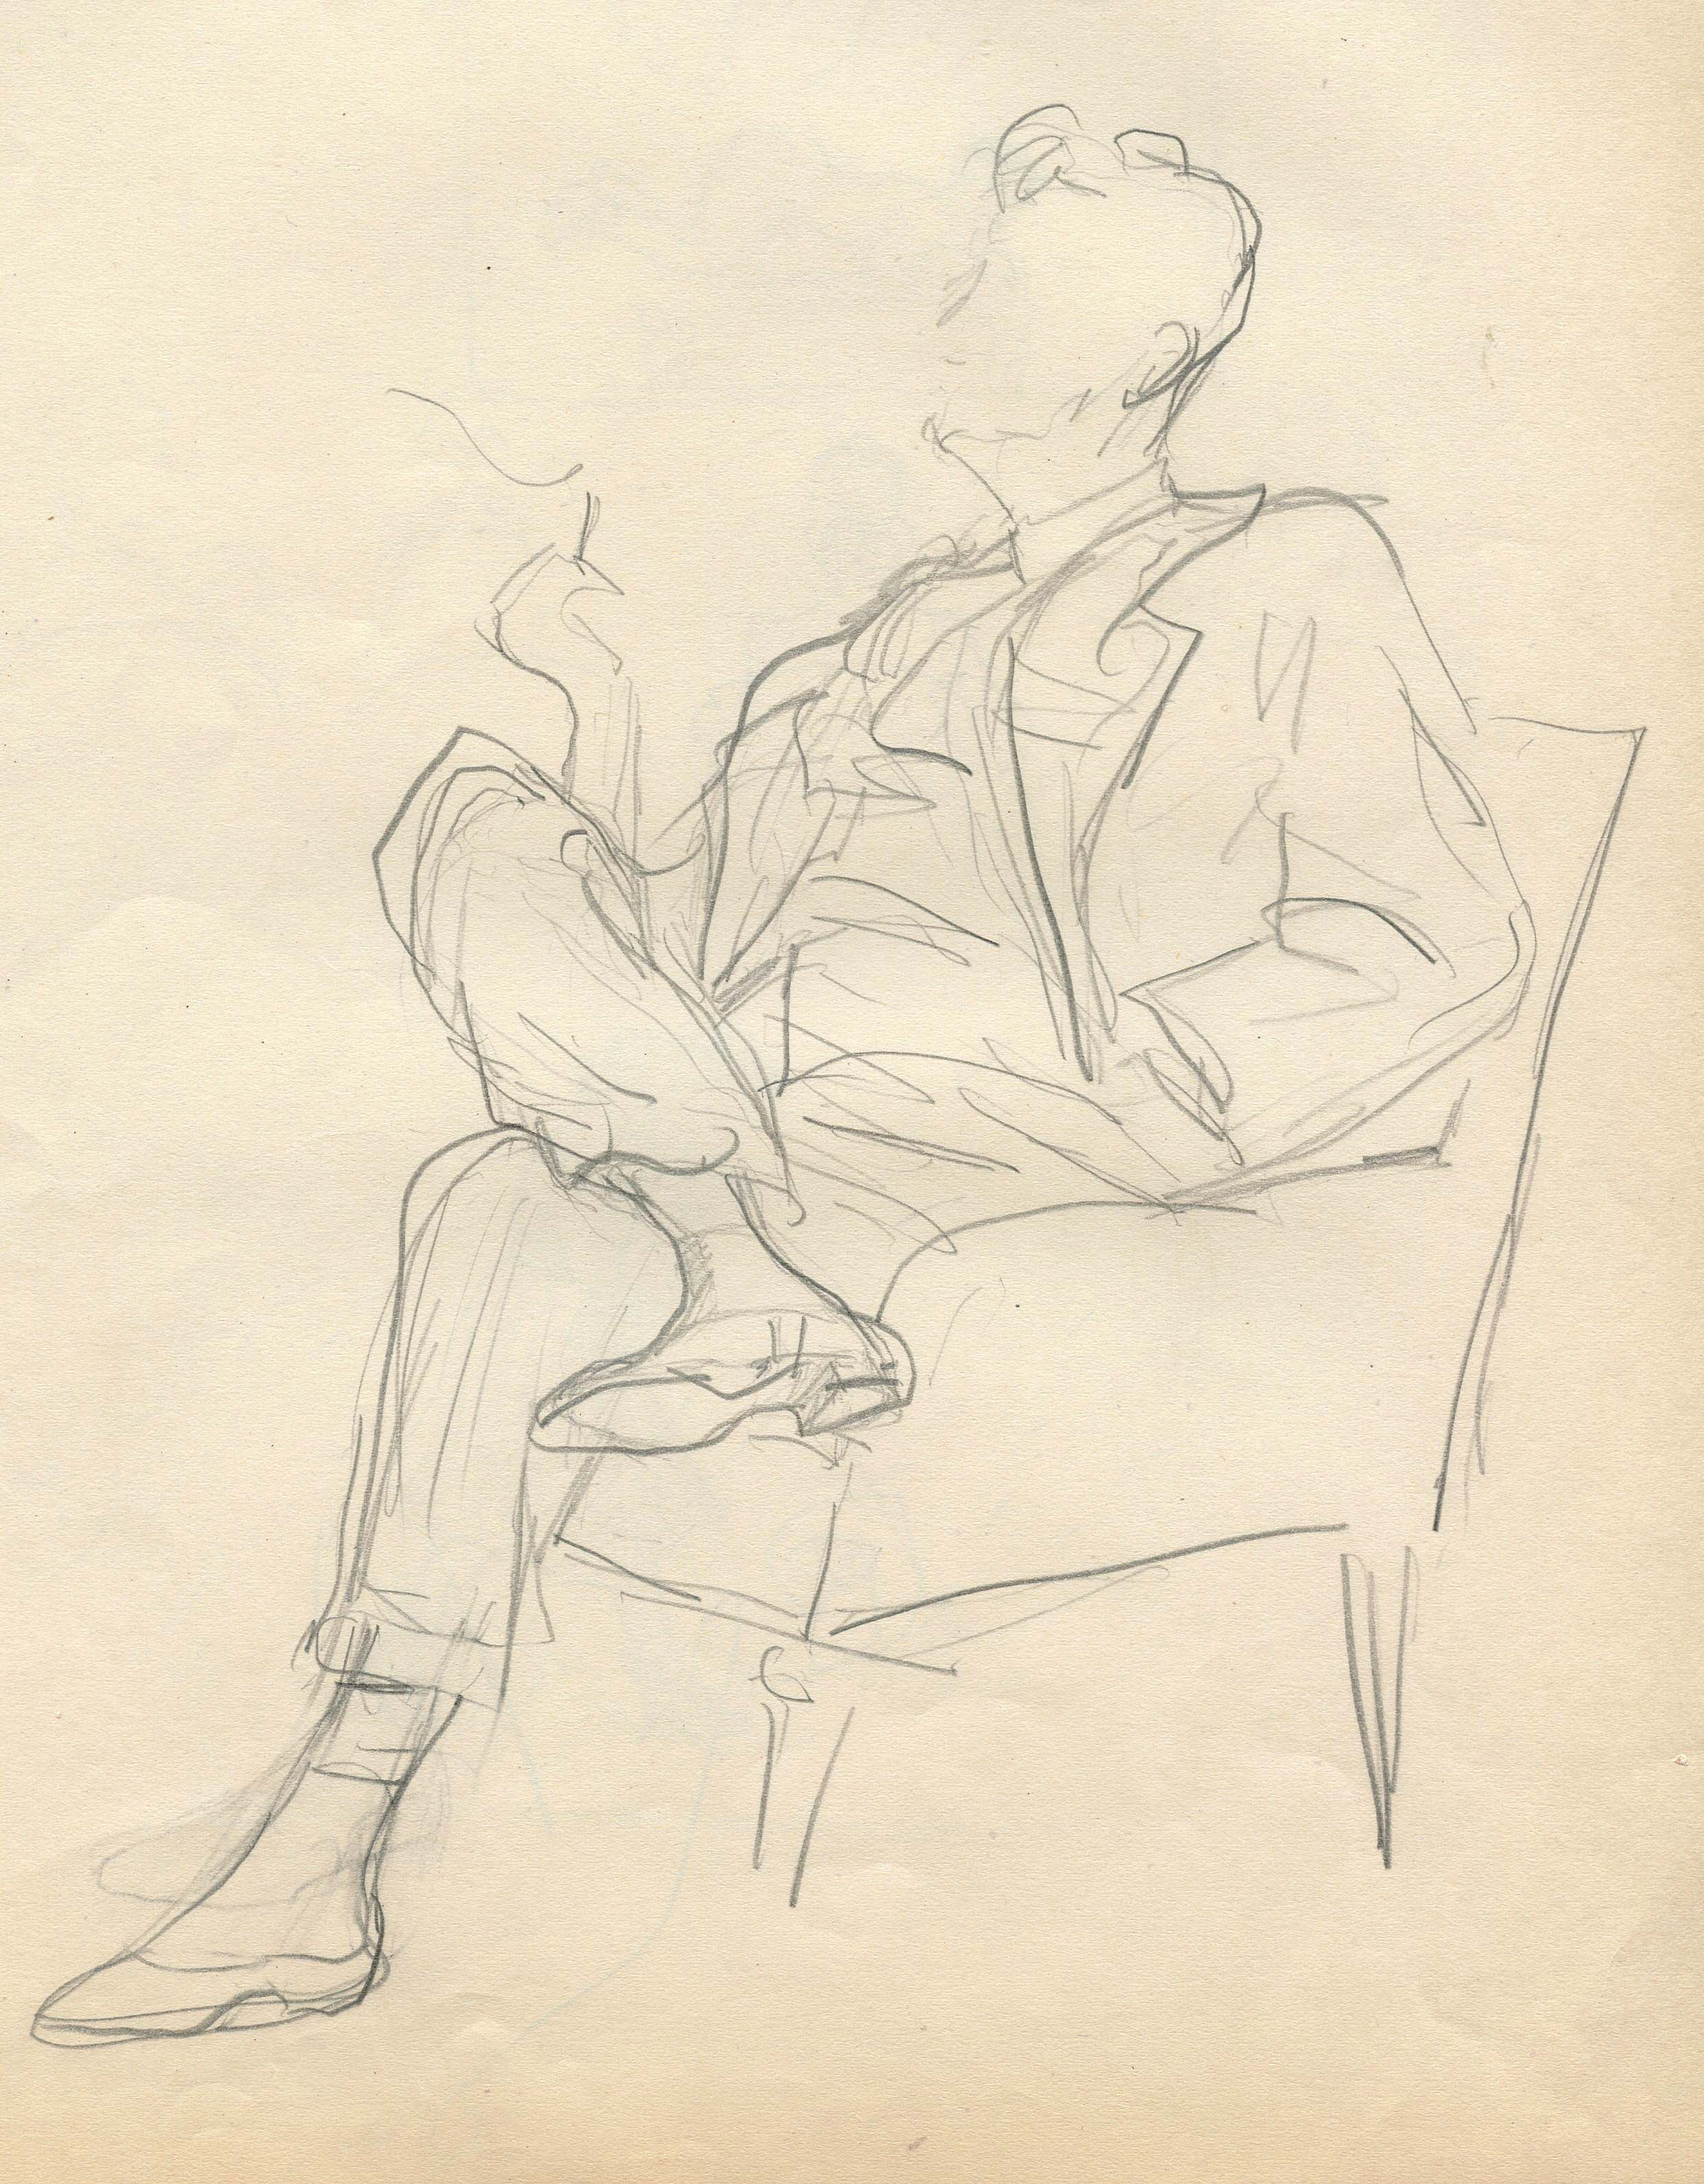 MSB, Leonard in his Element at the San Carlos Hotel; New York Cartoon Series, 1951.